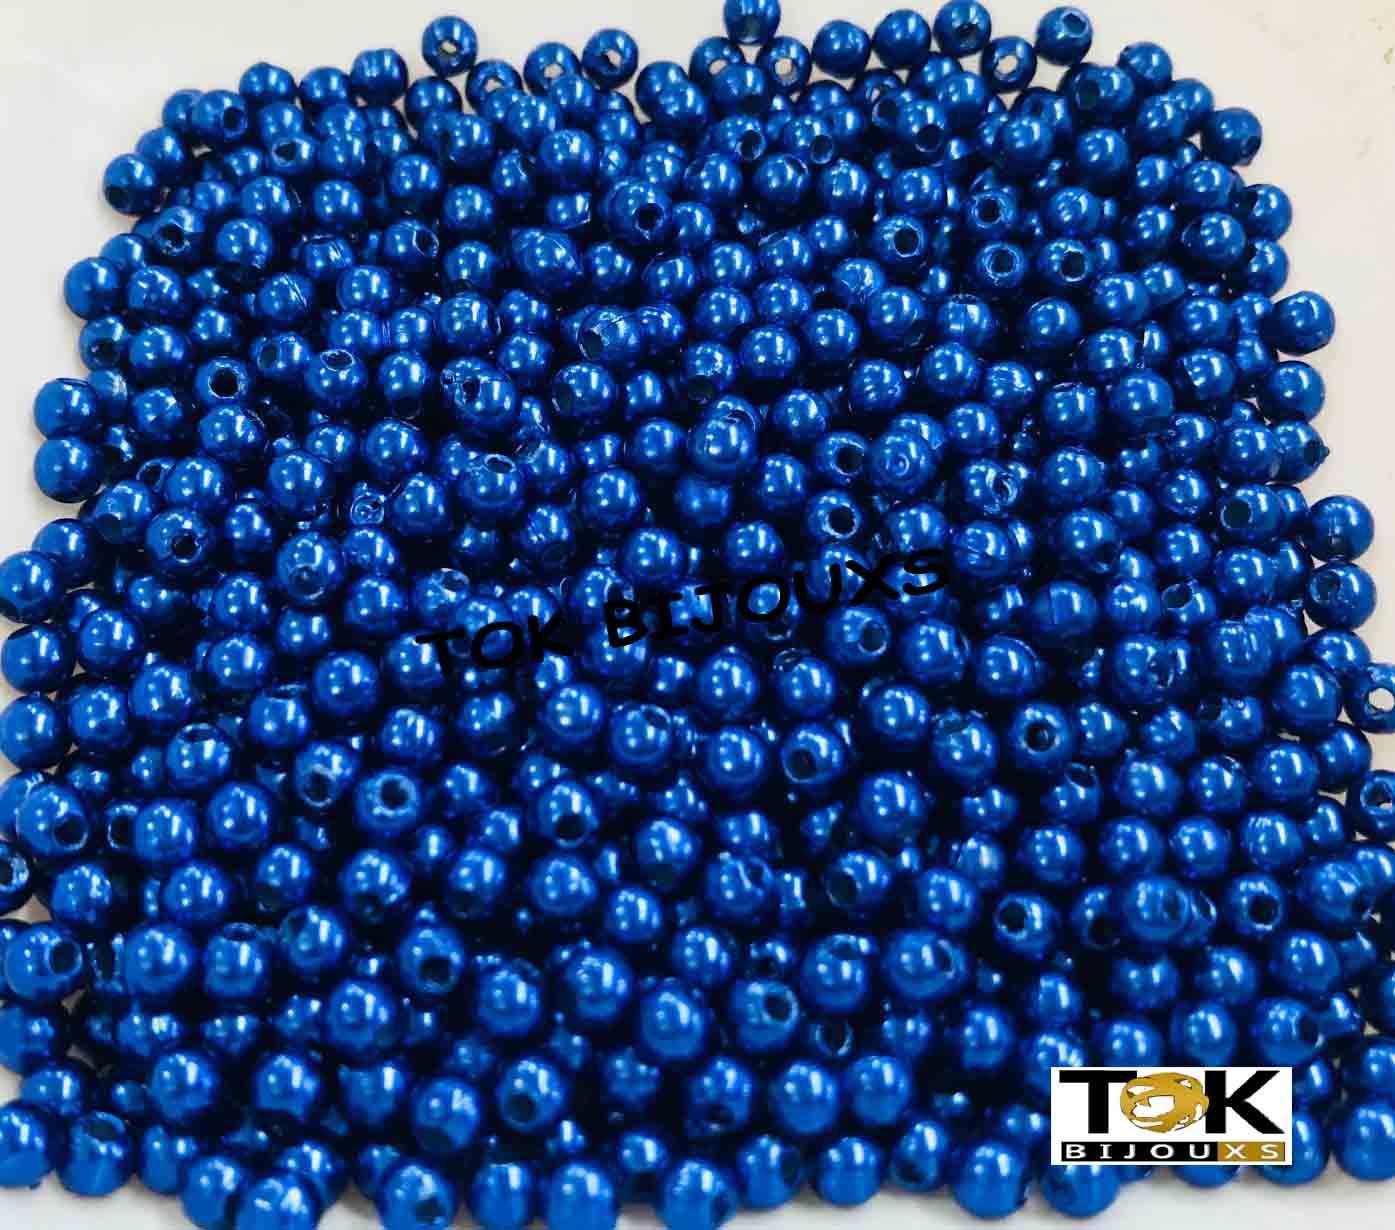 Pérola Abs 4mm - Azul Royal - 25g